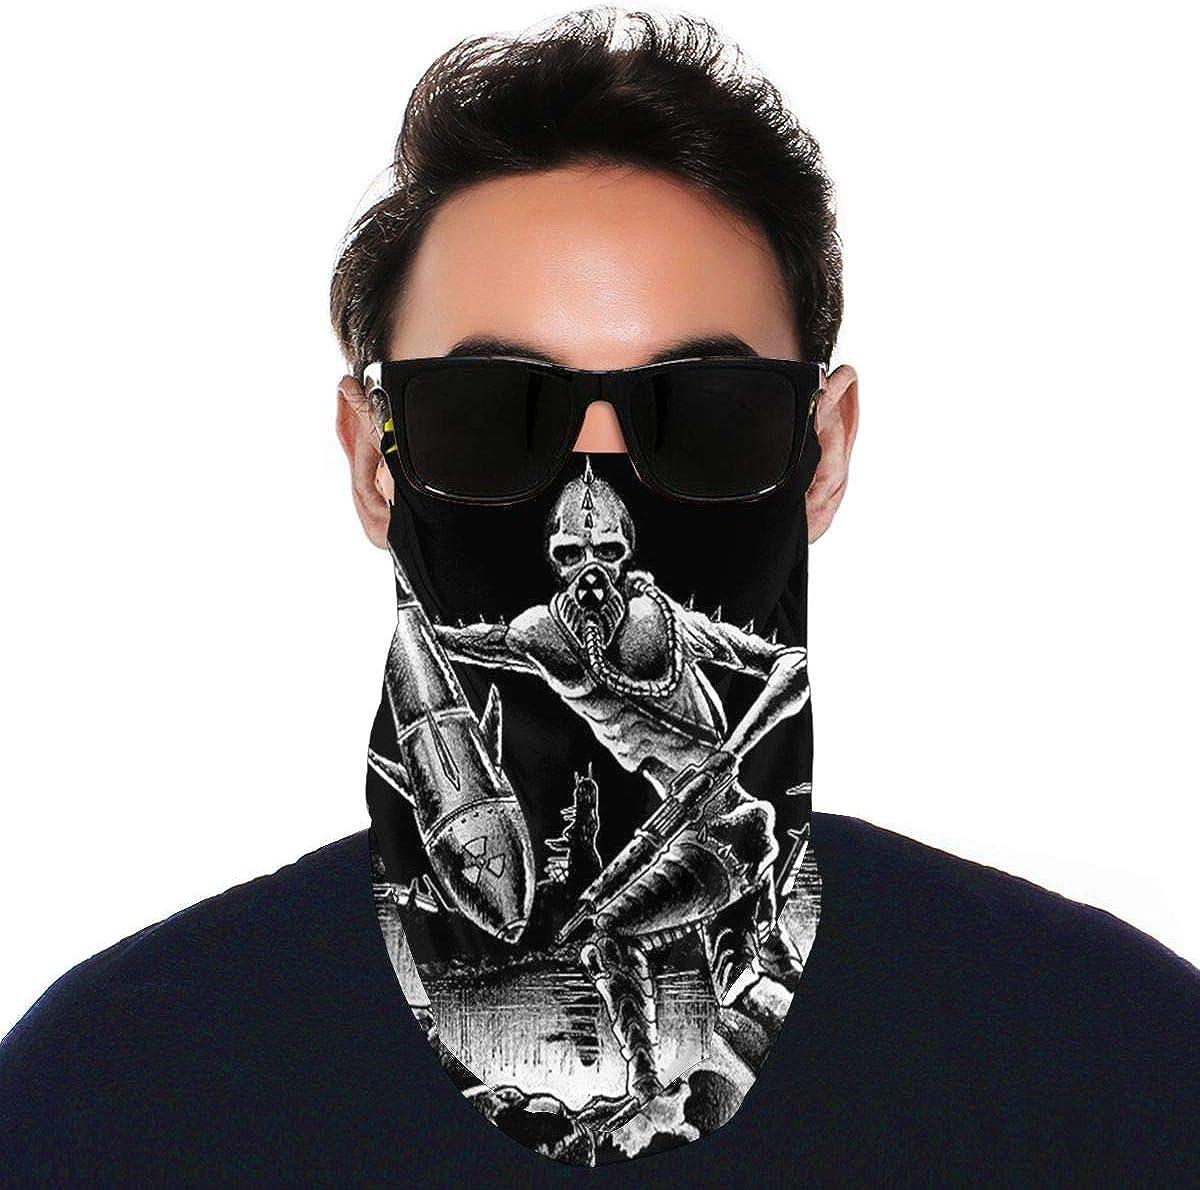 SIPONE Washable Men's & Women's Toxic Holocaust Reusable Multiuse Bandanas Neck Gaiter Print Mask